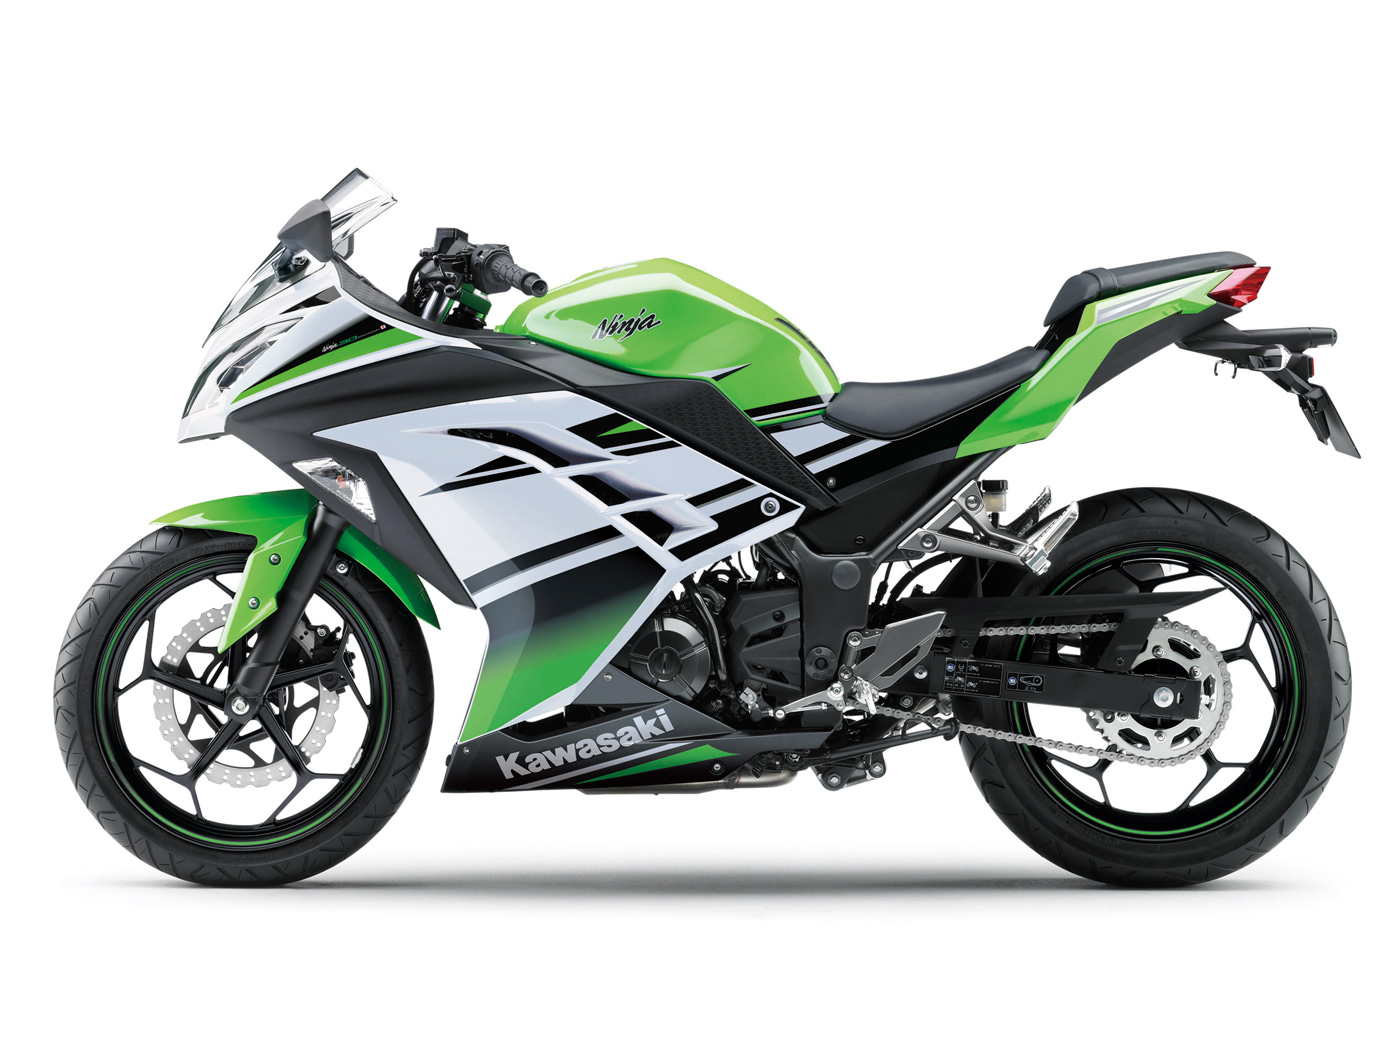 Kawasaki Ninja 300 R 30ème anniversaire 2015 - 11